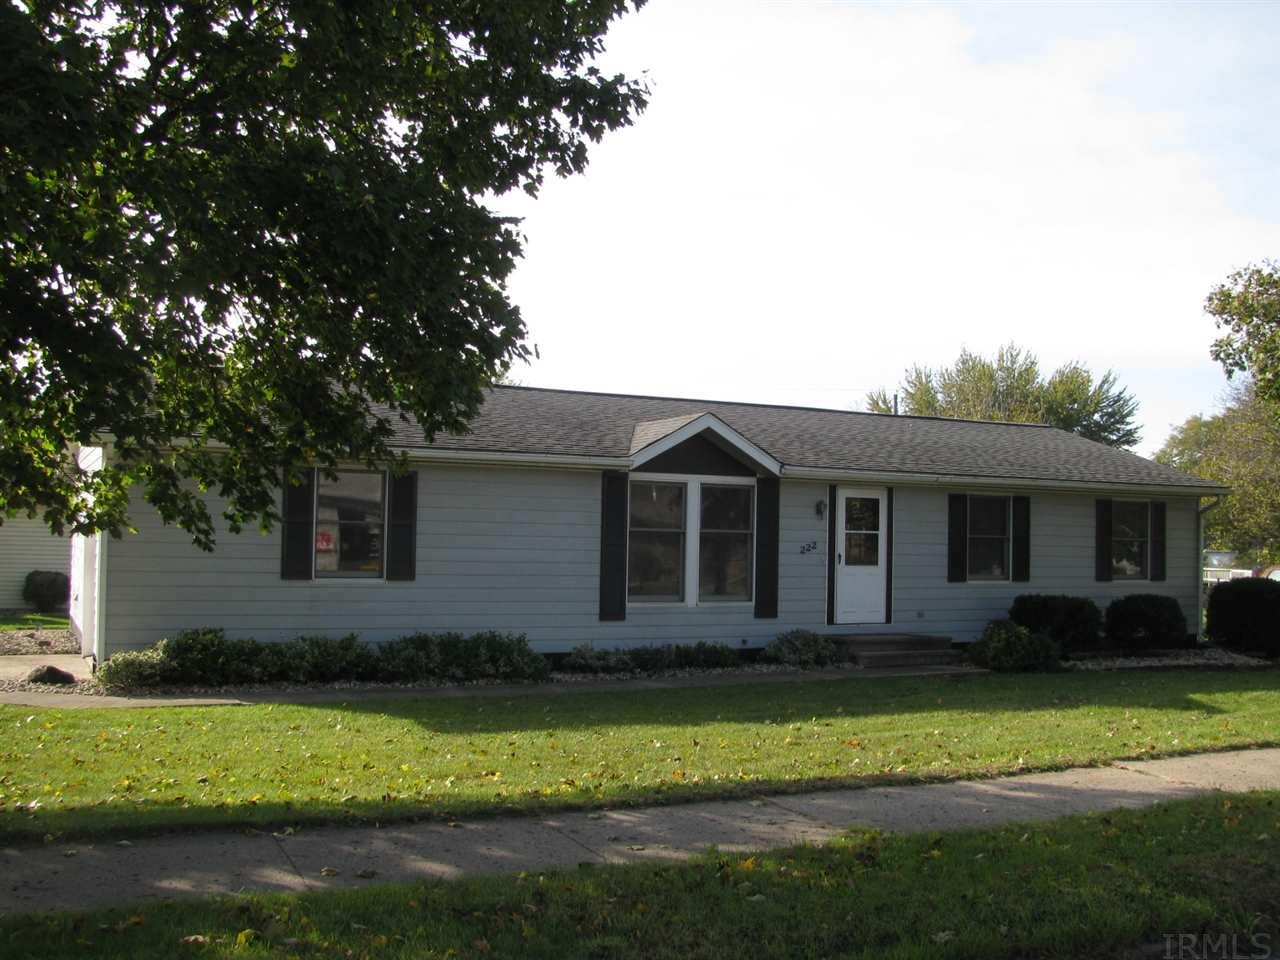 222 E North St., Kendallville, IN 46755